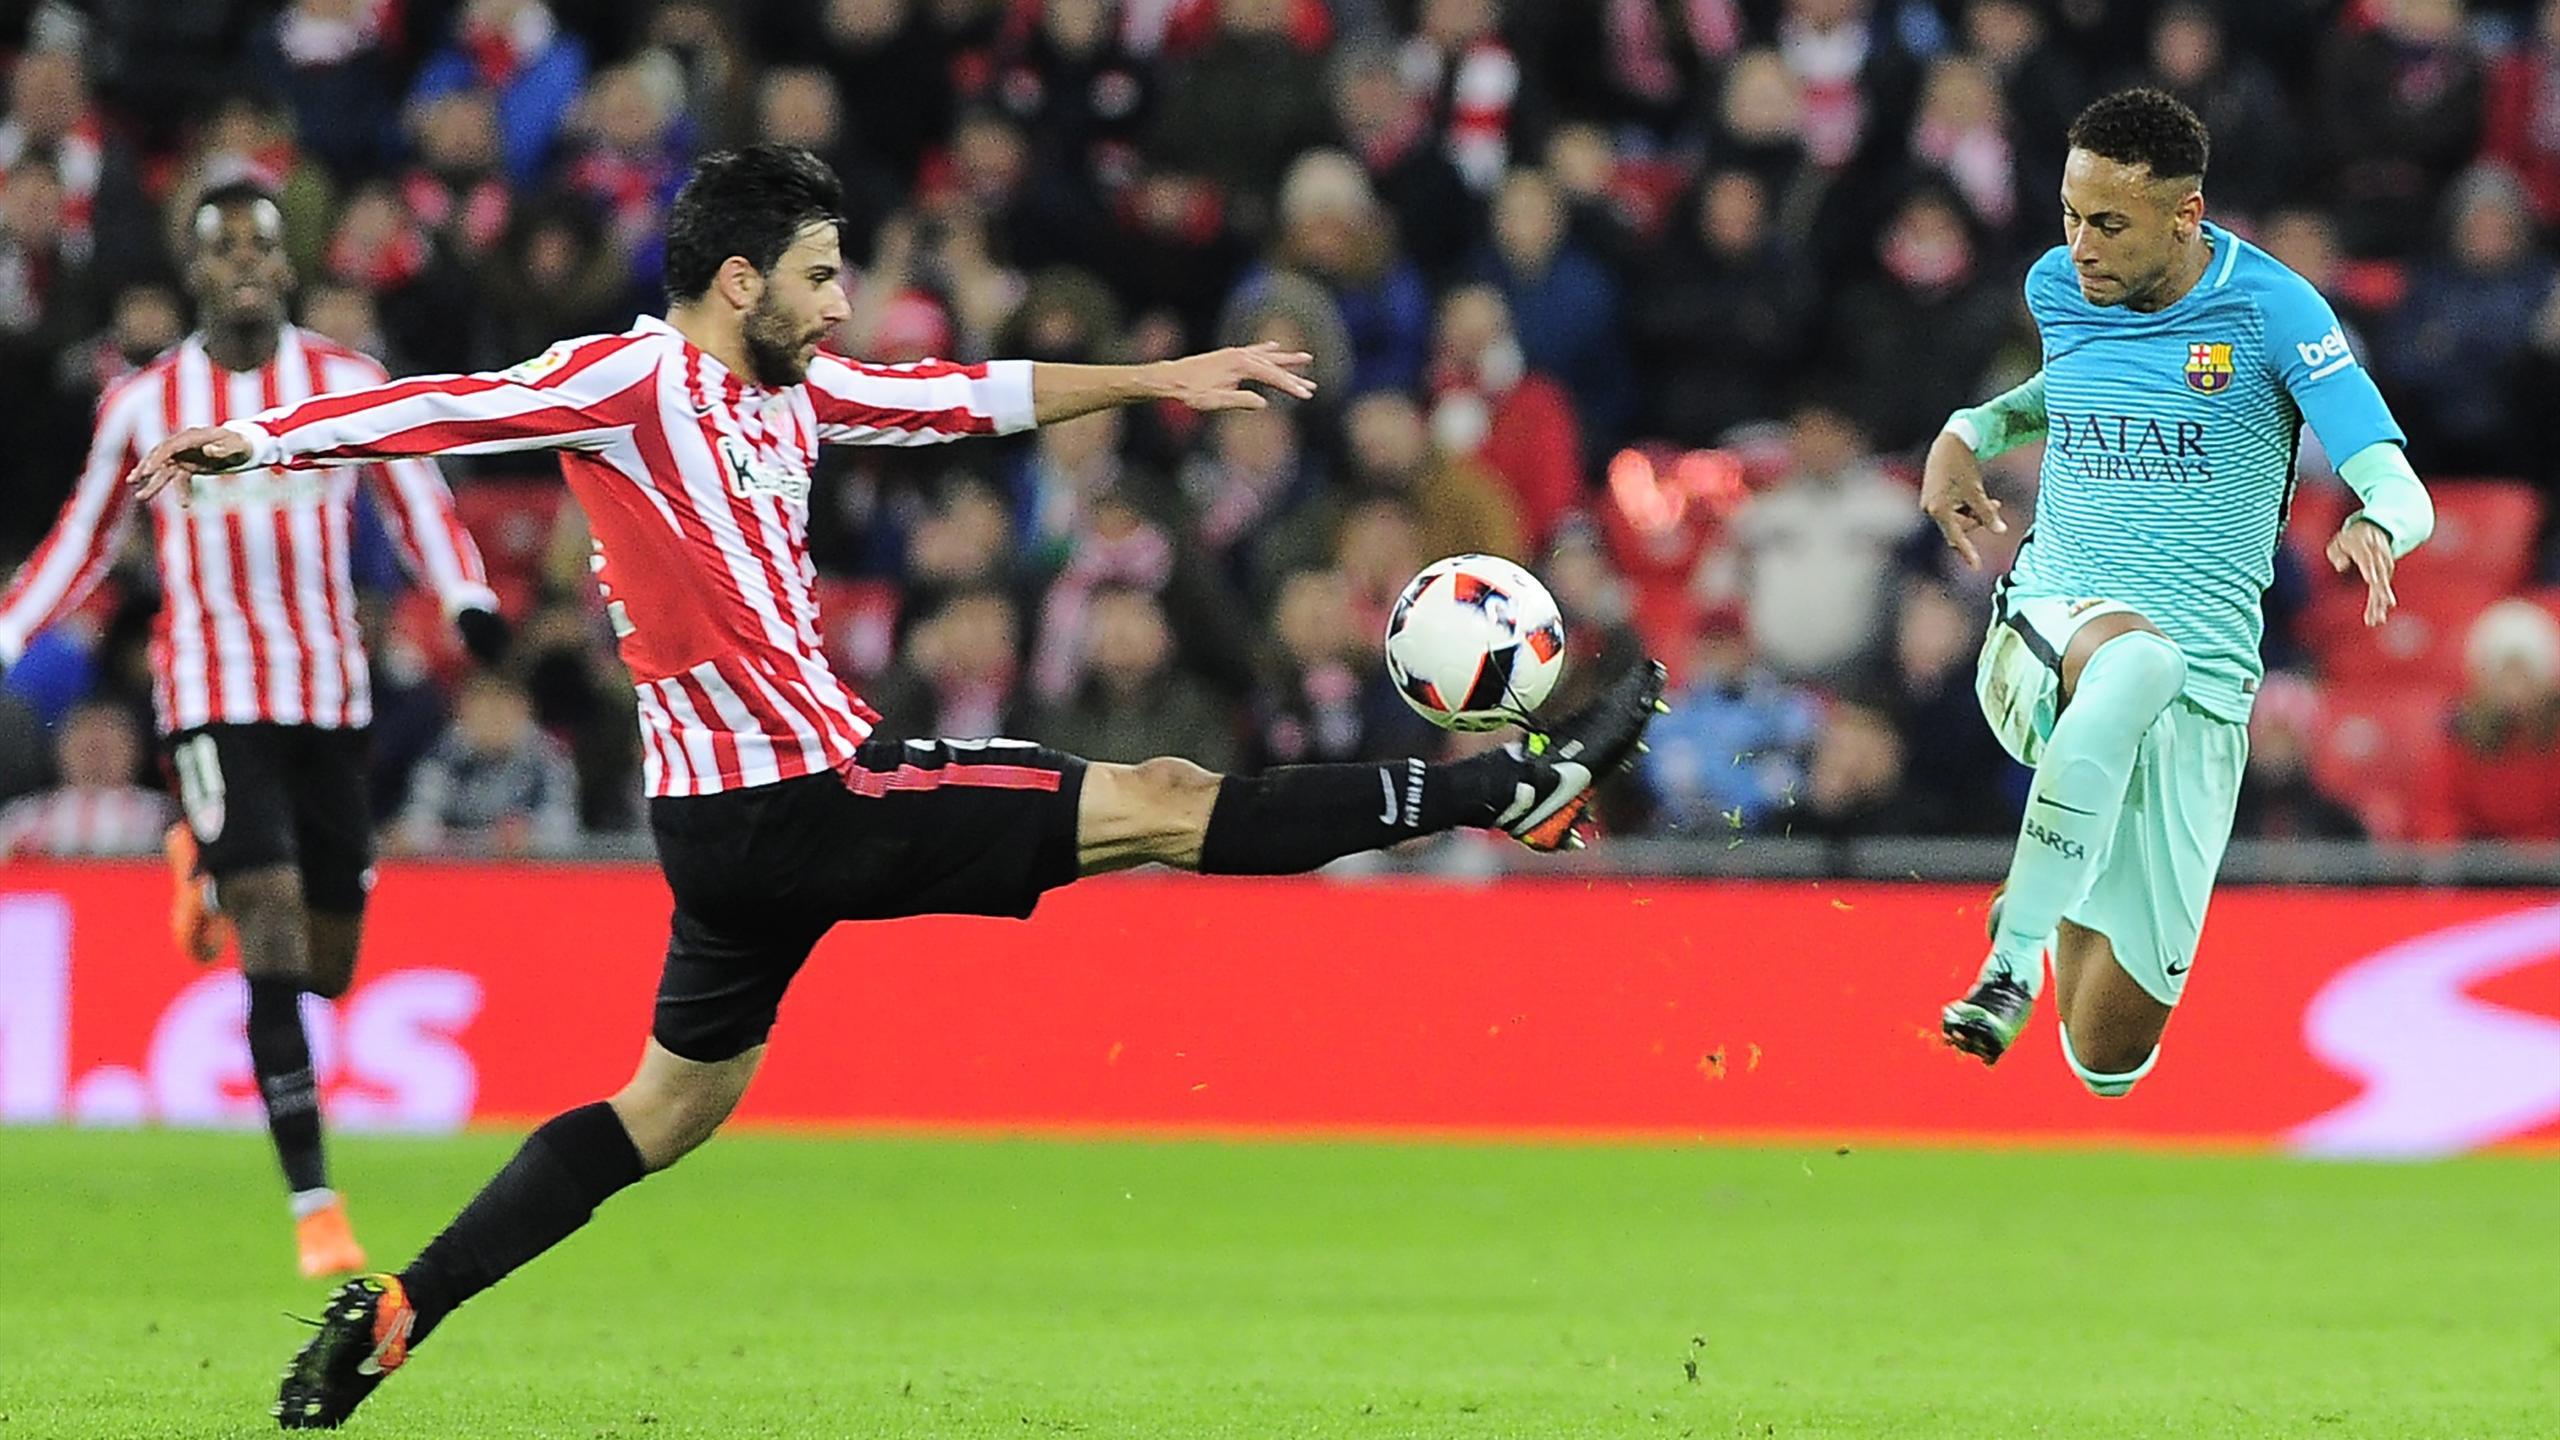 L'élégance d'Eneko Boveda (Athletic Bilbao) devant Neymar (FC Barcelone)